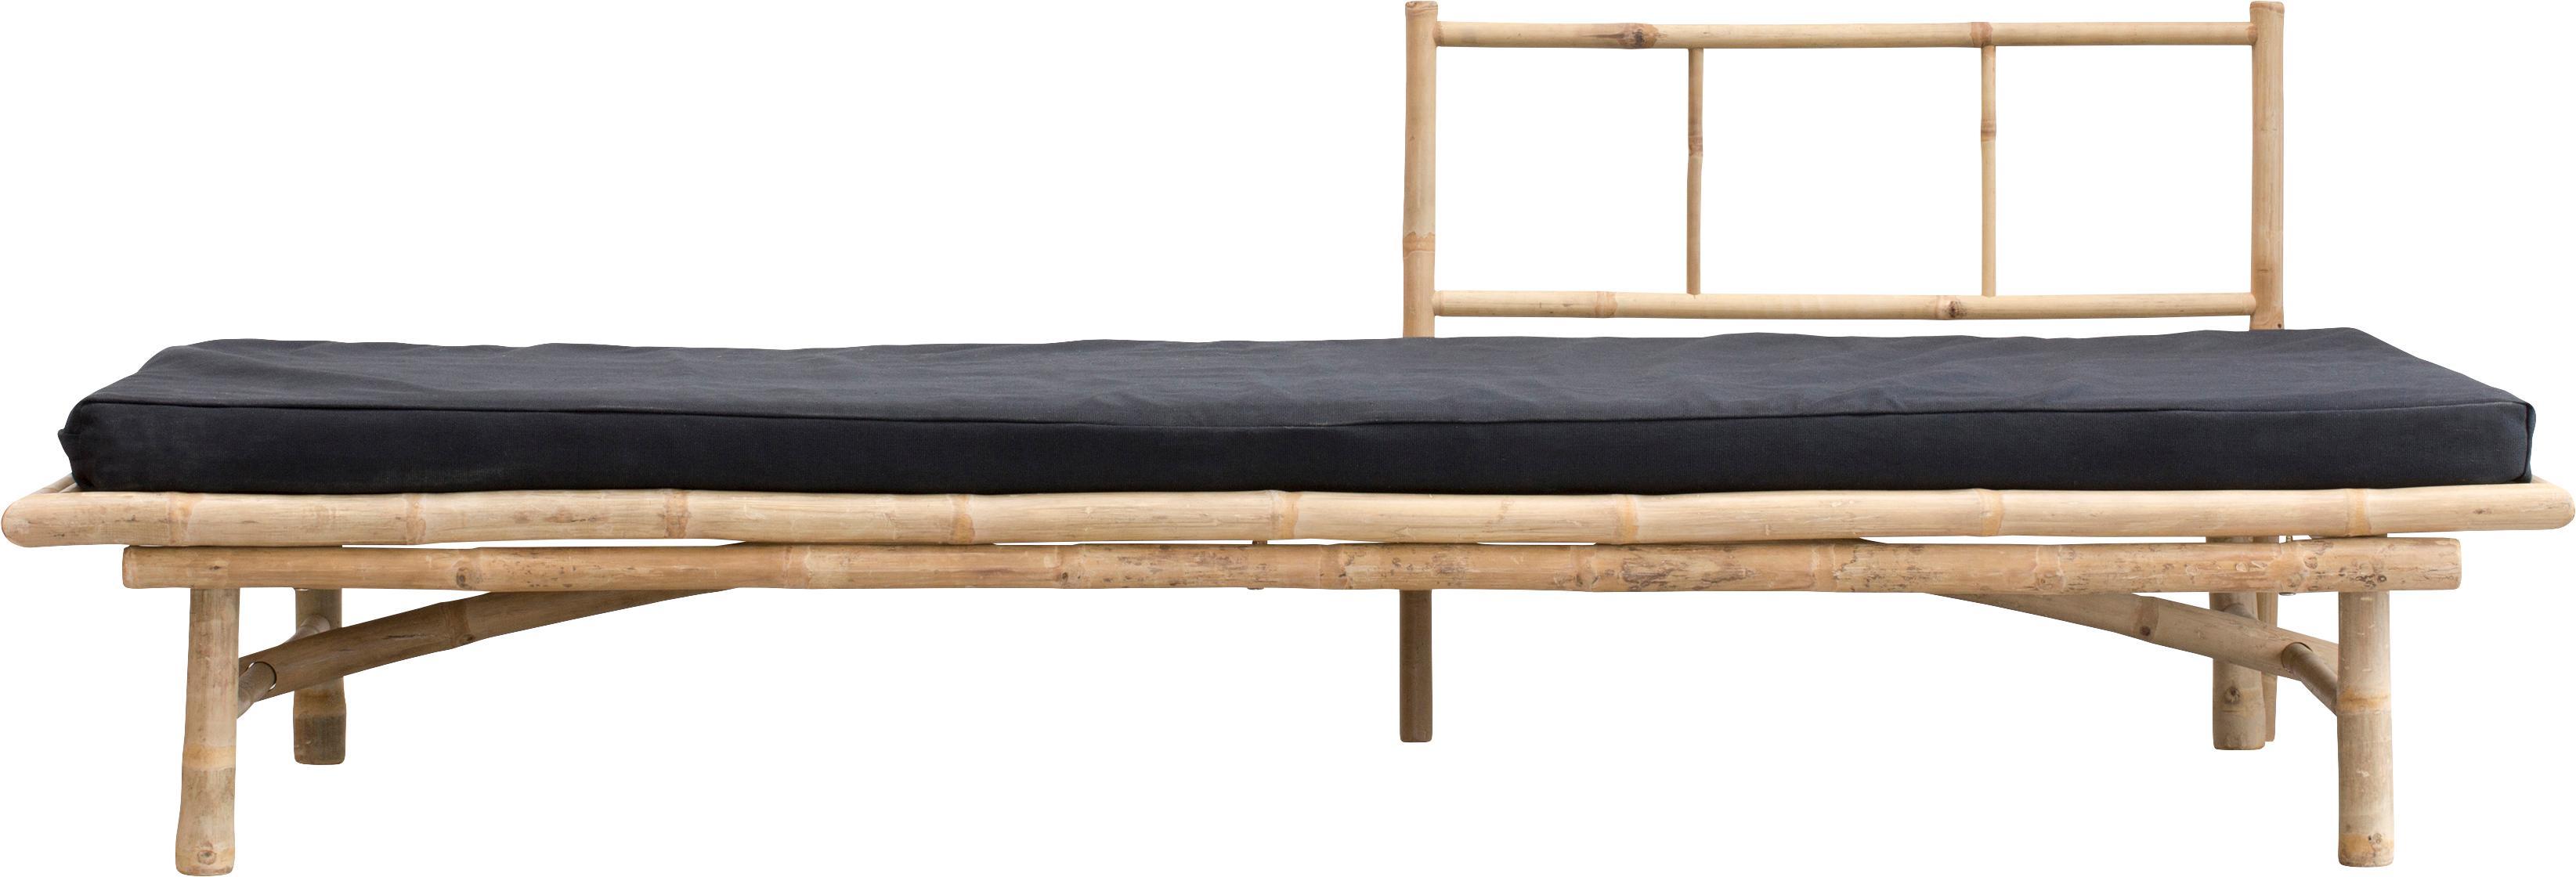 Diván de bambú Mandisa, Estructura: bambú, natural, Tapizado: poliéster, Bambú, negro, An 215 x F 100 cm